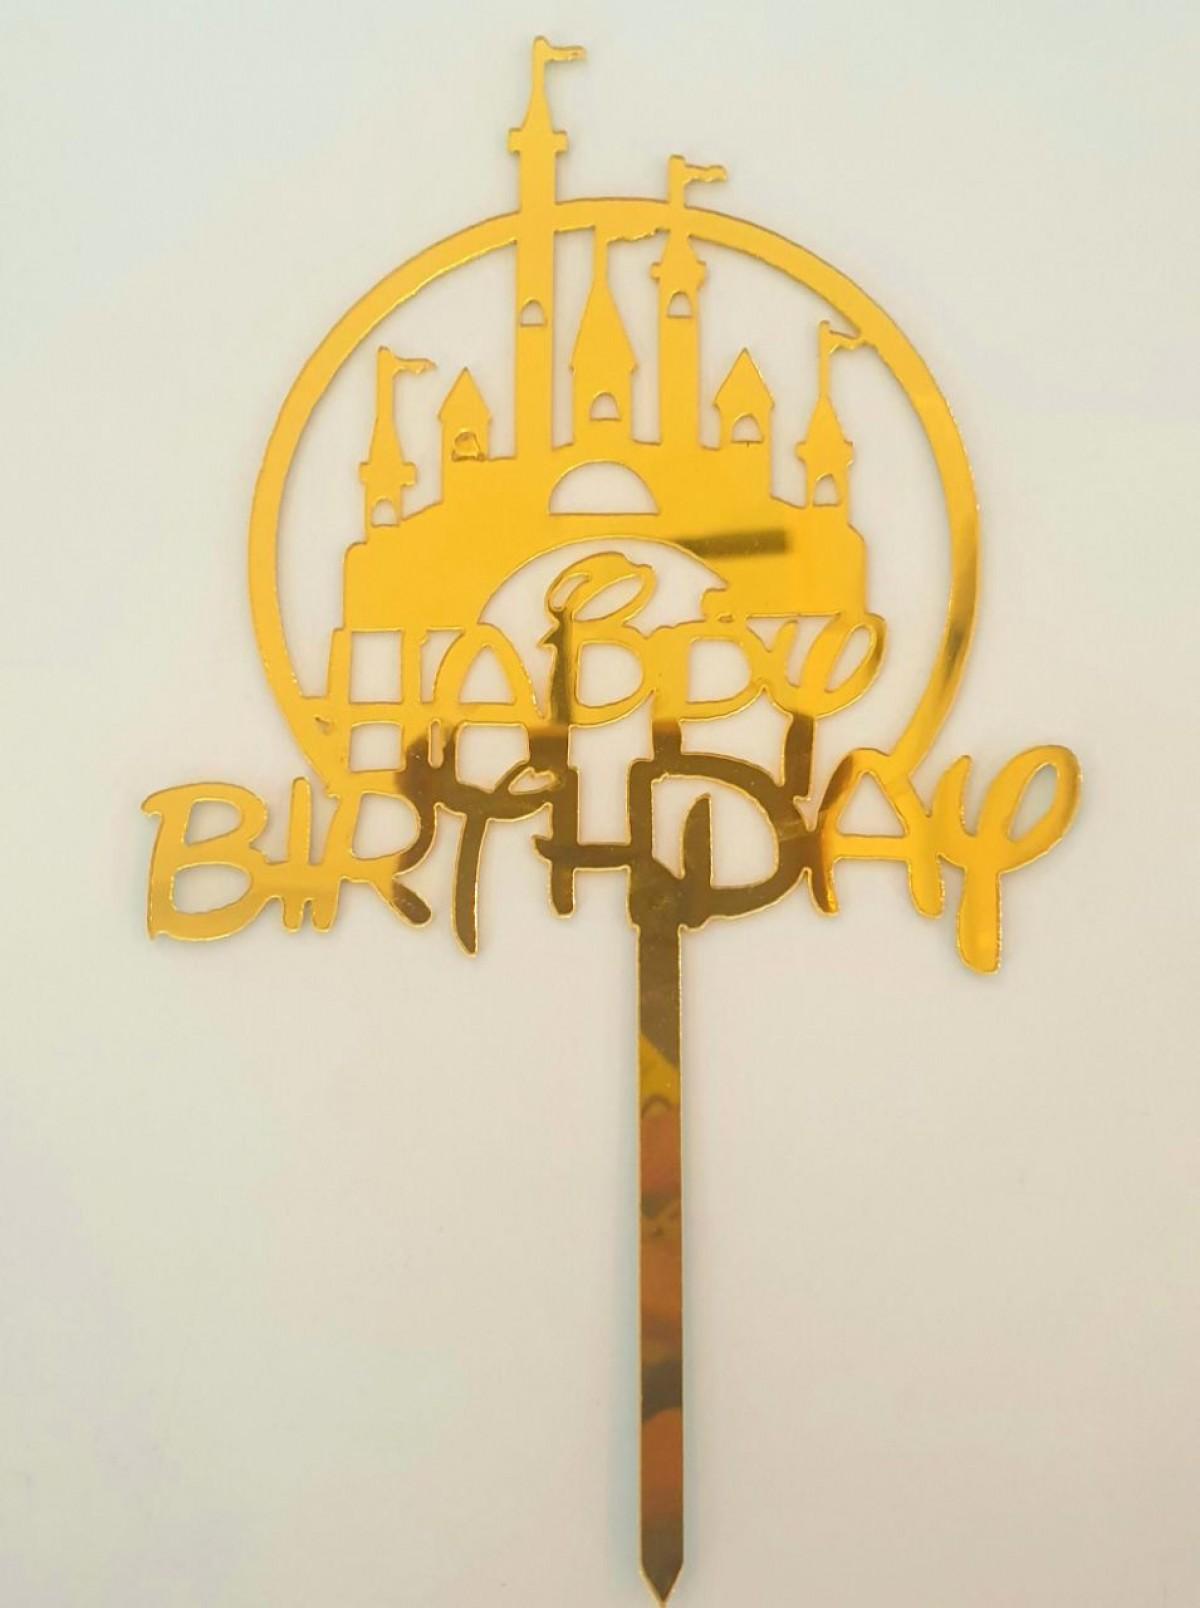 TOPPER HAPPY BIRTHDAY(CASTLE) - RARA KITCHY